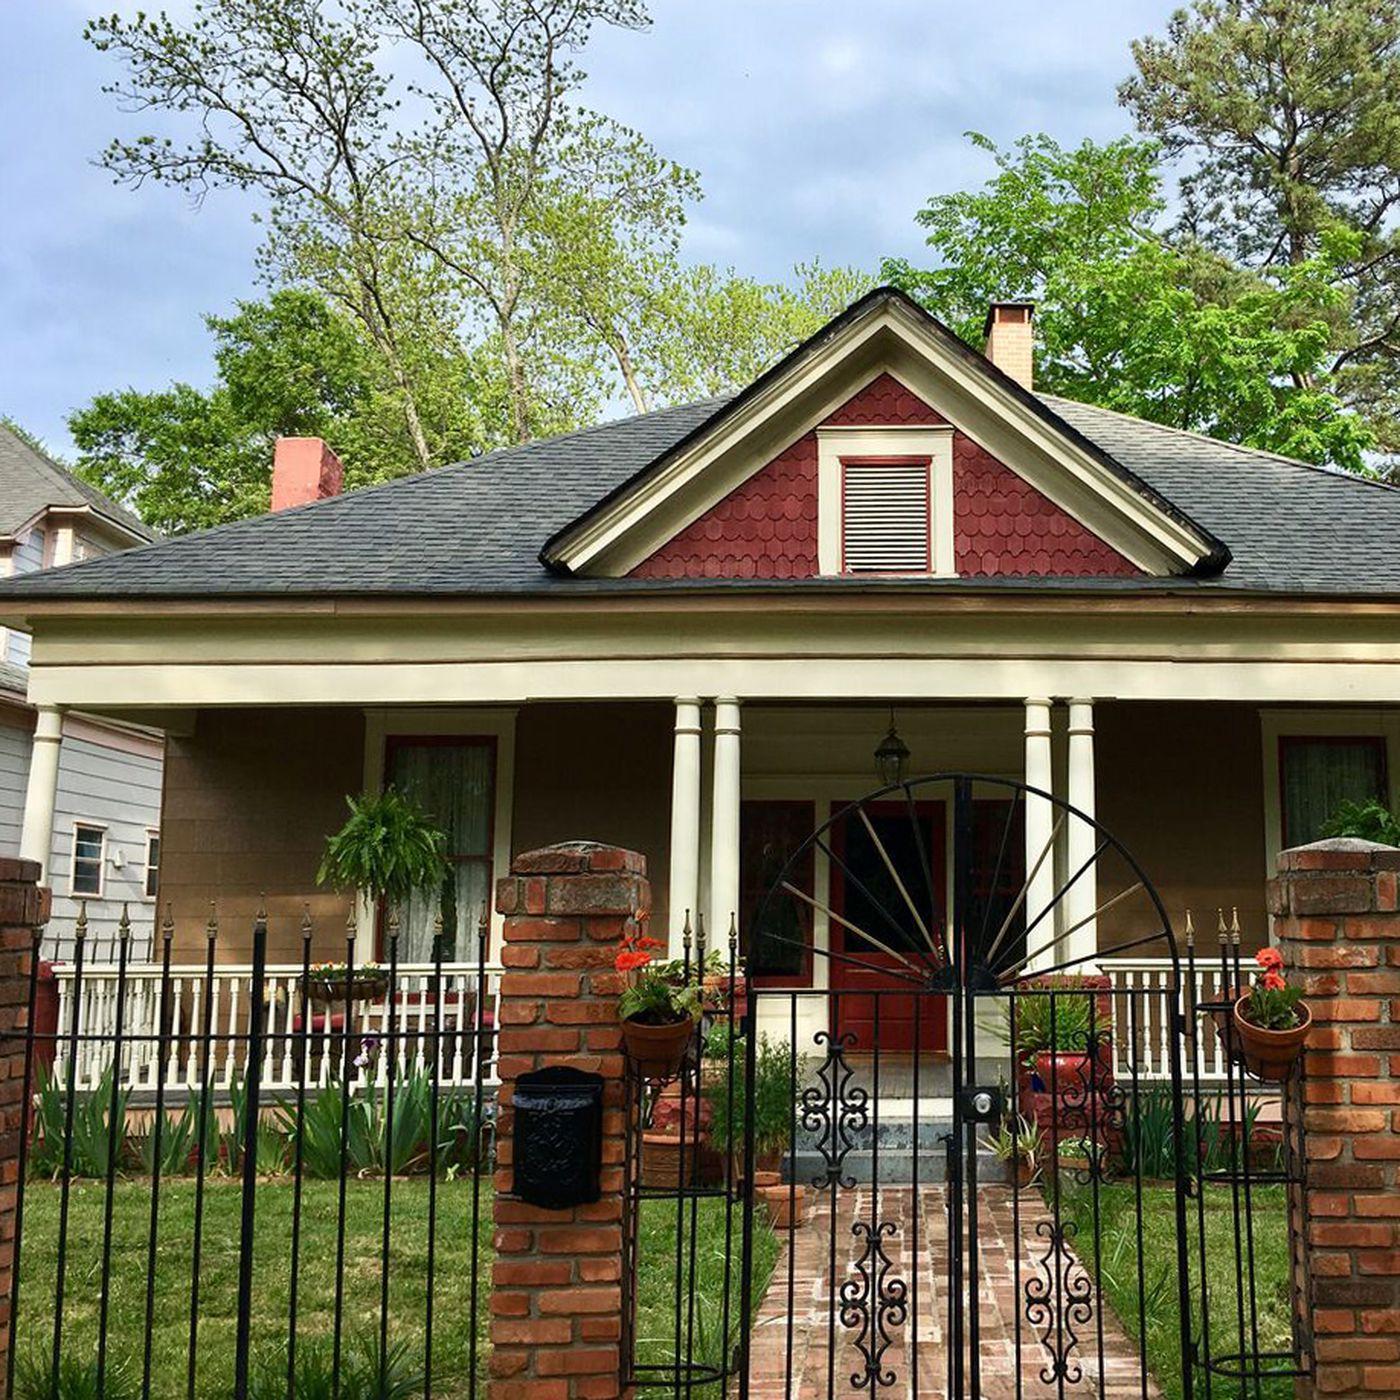 Southwest Atlanta Neighborhoods Homes Offered Up In Weekend Tour Curbed Atlanta